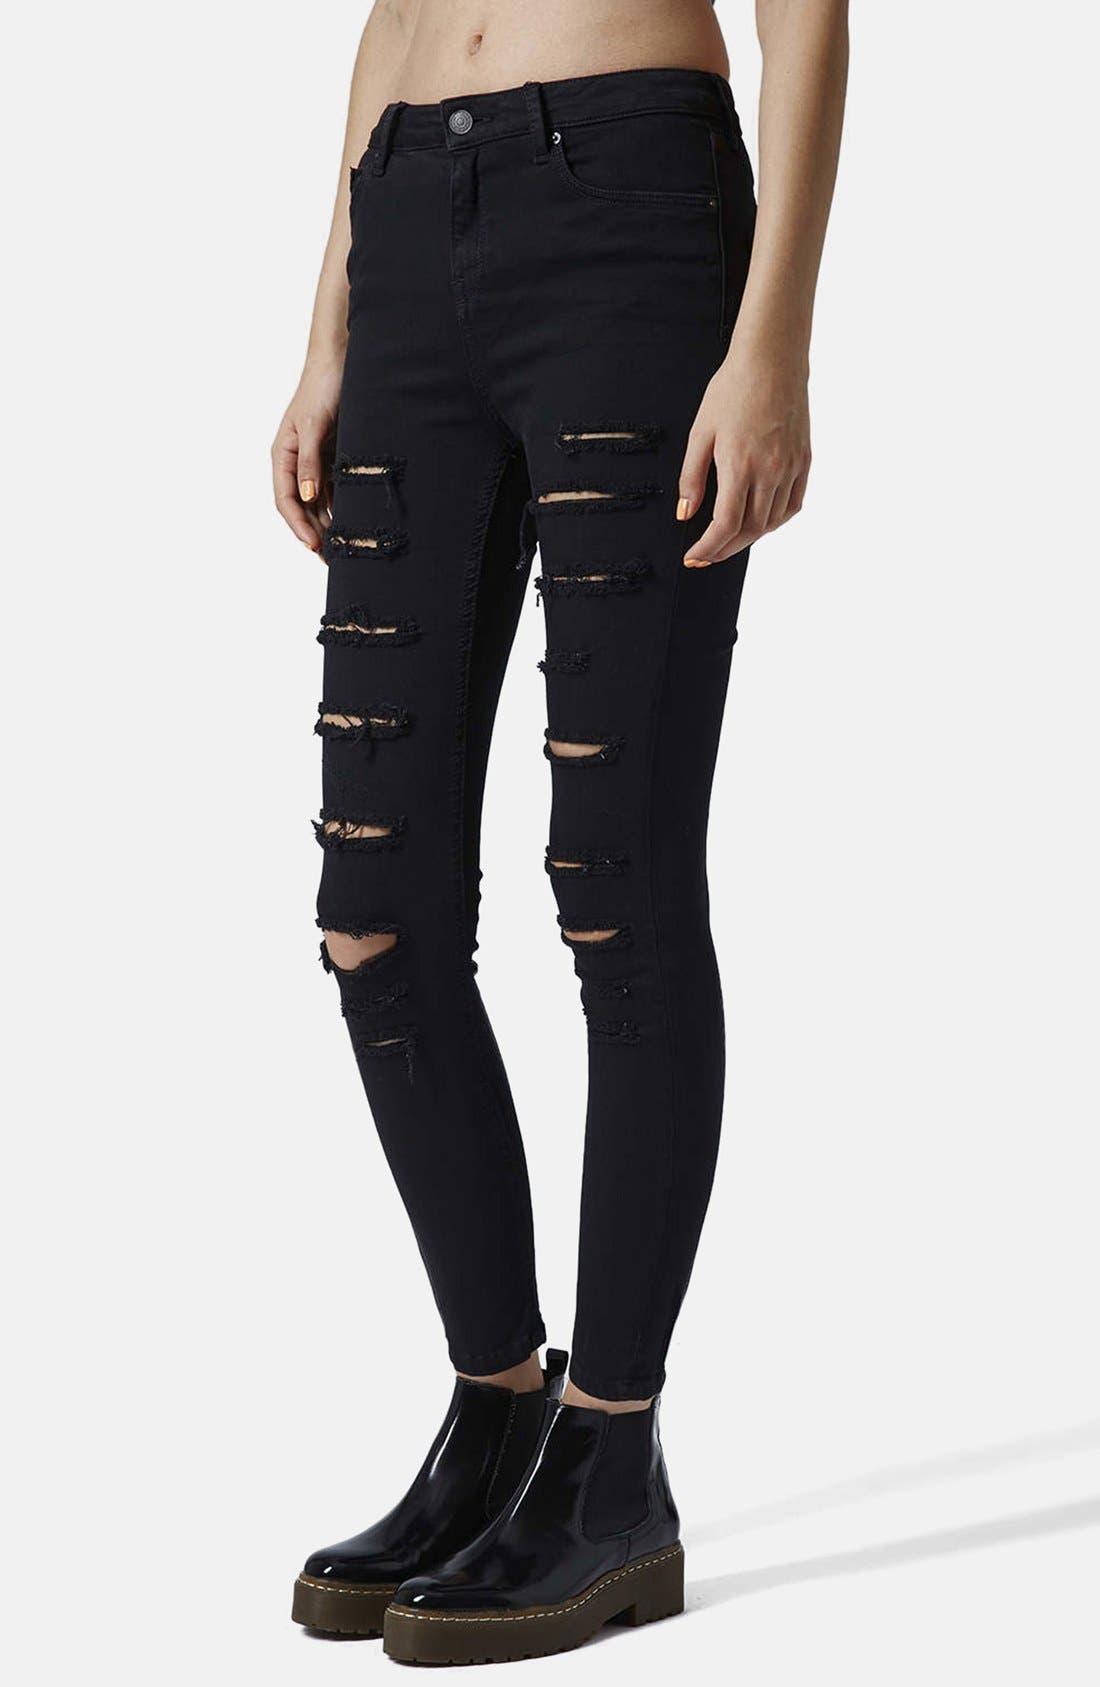 Alternate Image 1 Selected - Topshop 'Jamie' Ripped High Rise Skinny Jeans (Black)